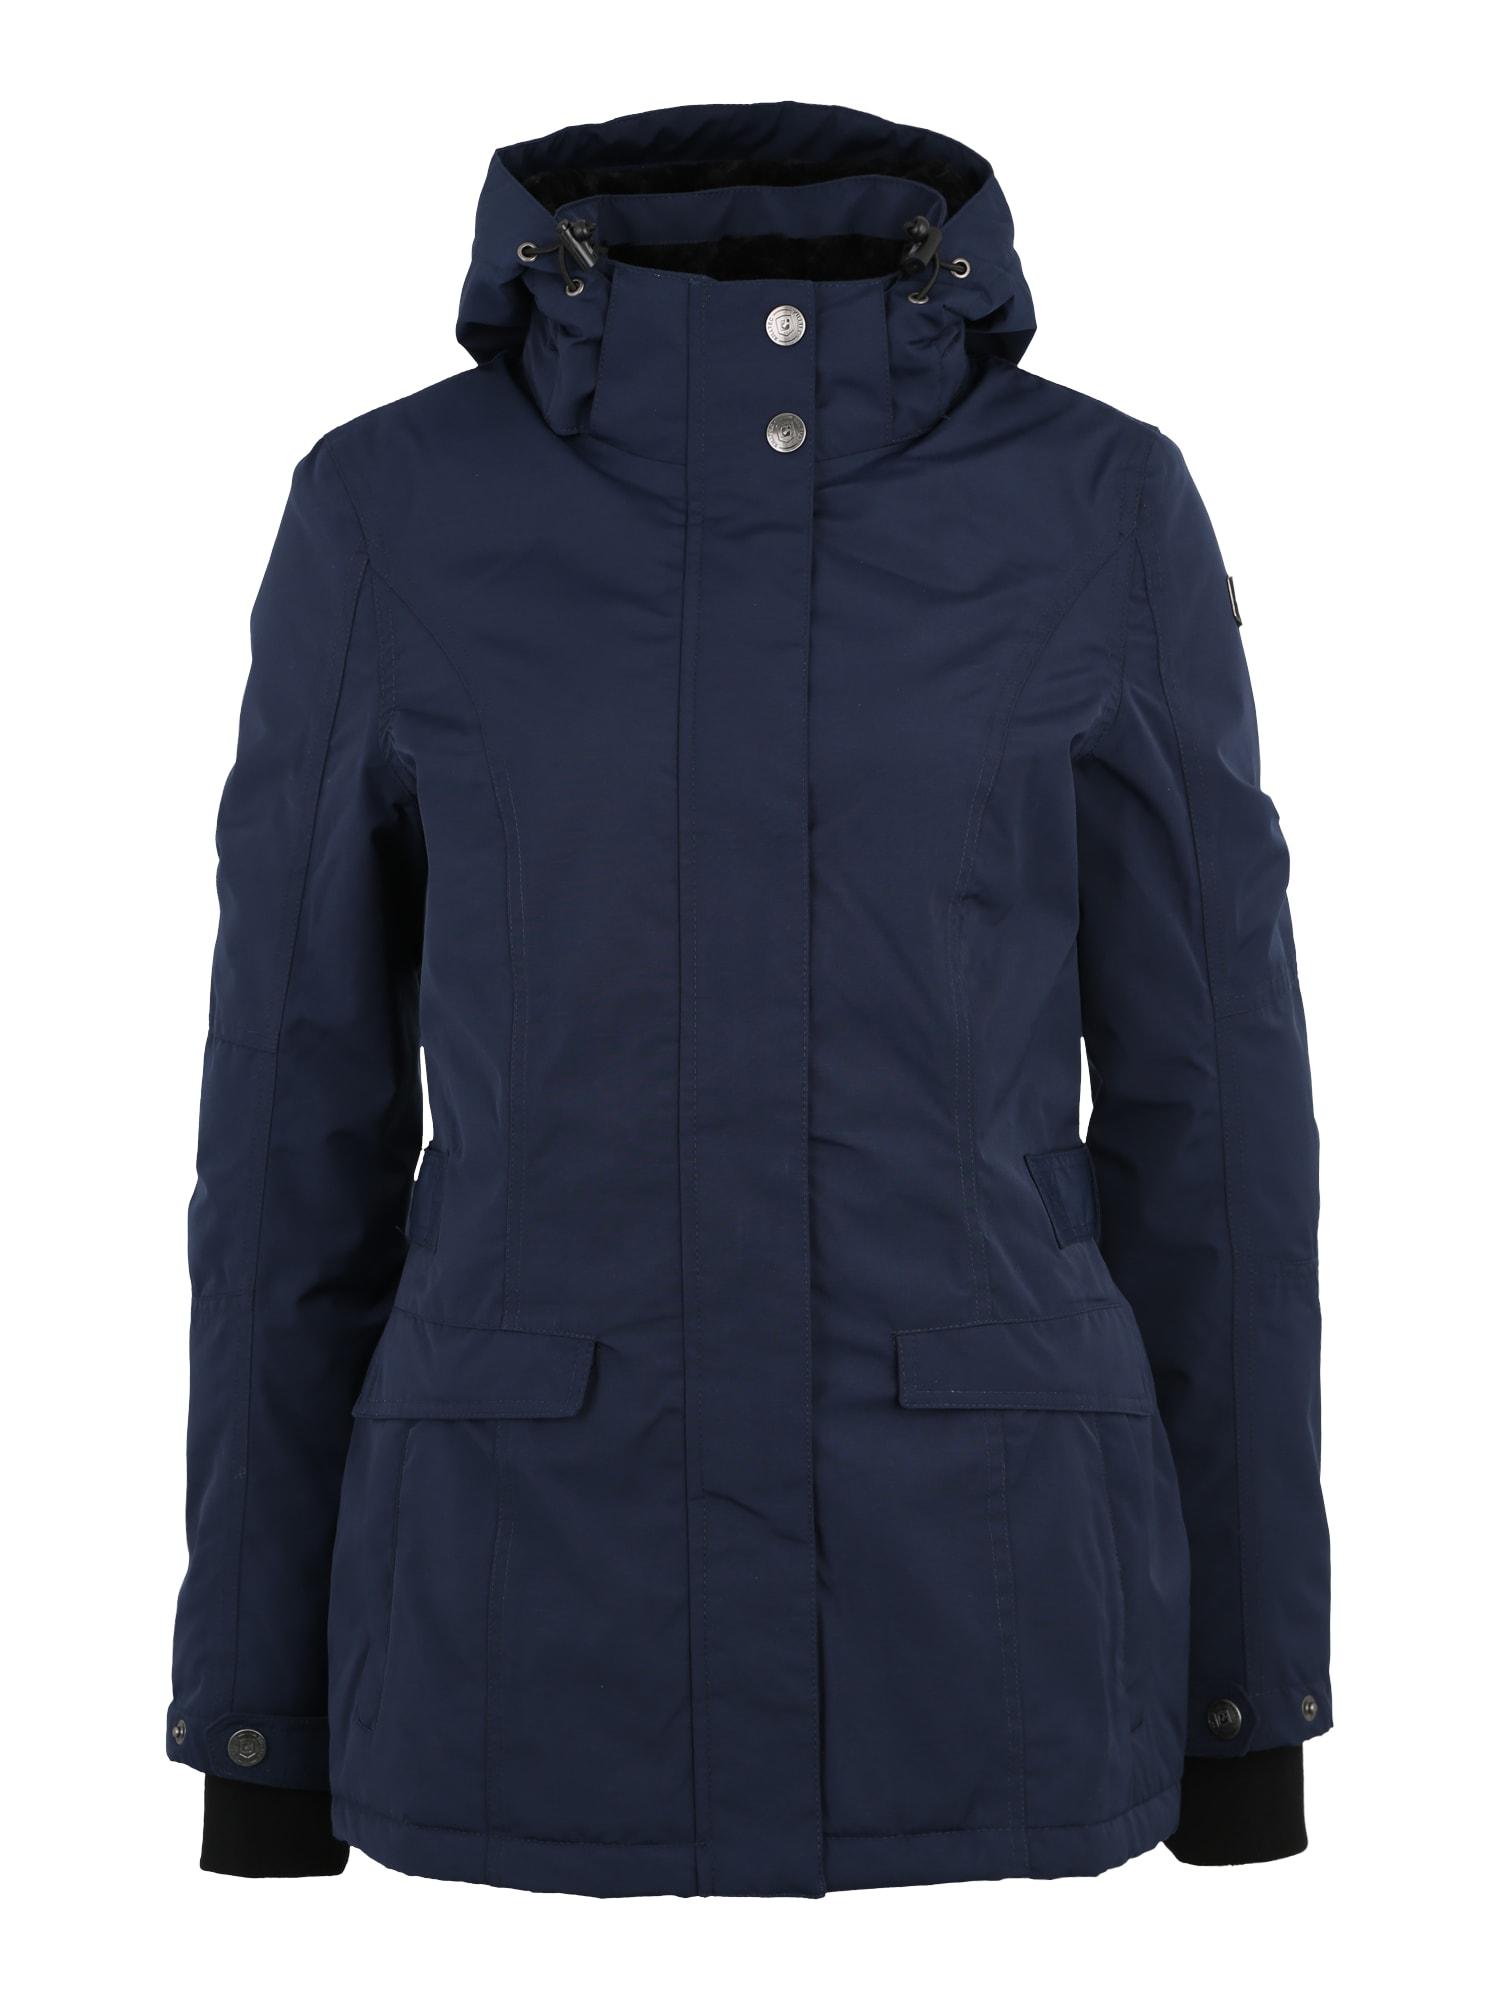 Outdoorová bunda Ellika tmavě modrá KILLTEC